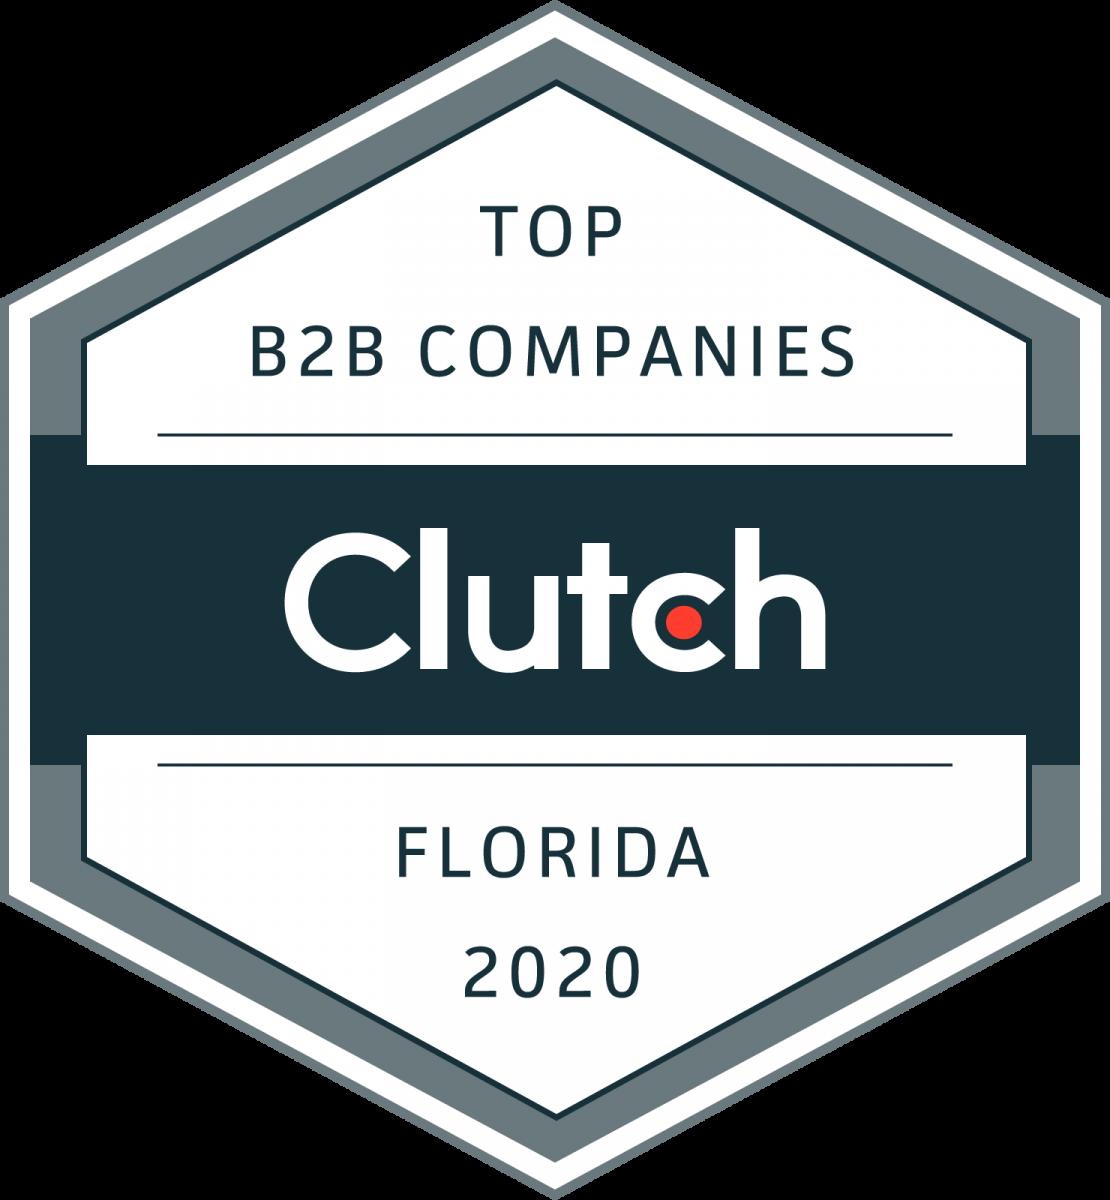 Top B2B Companies Florida 2020